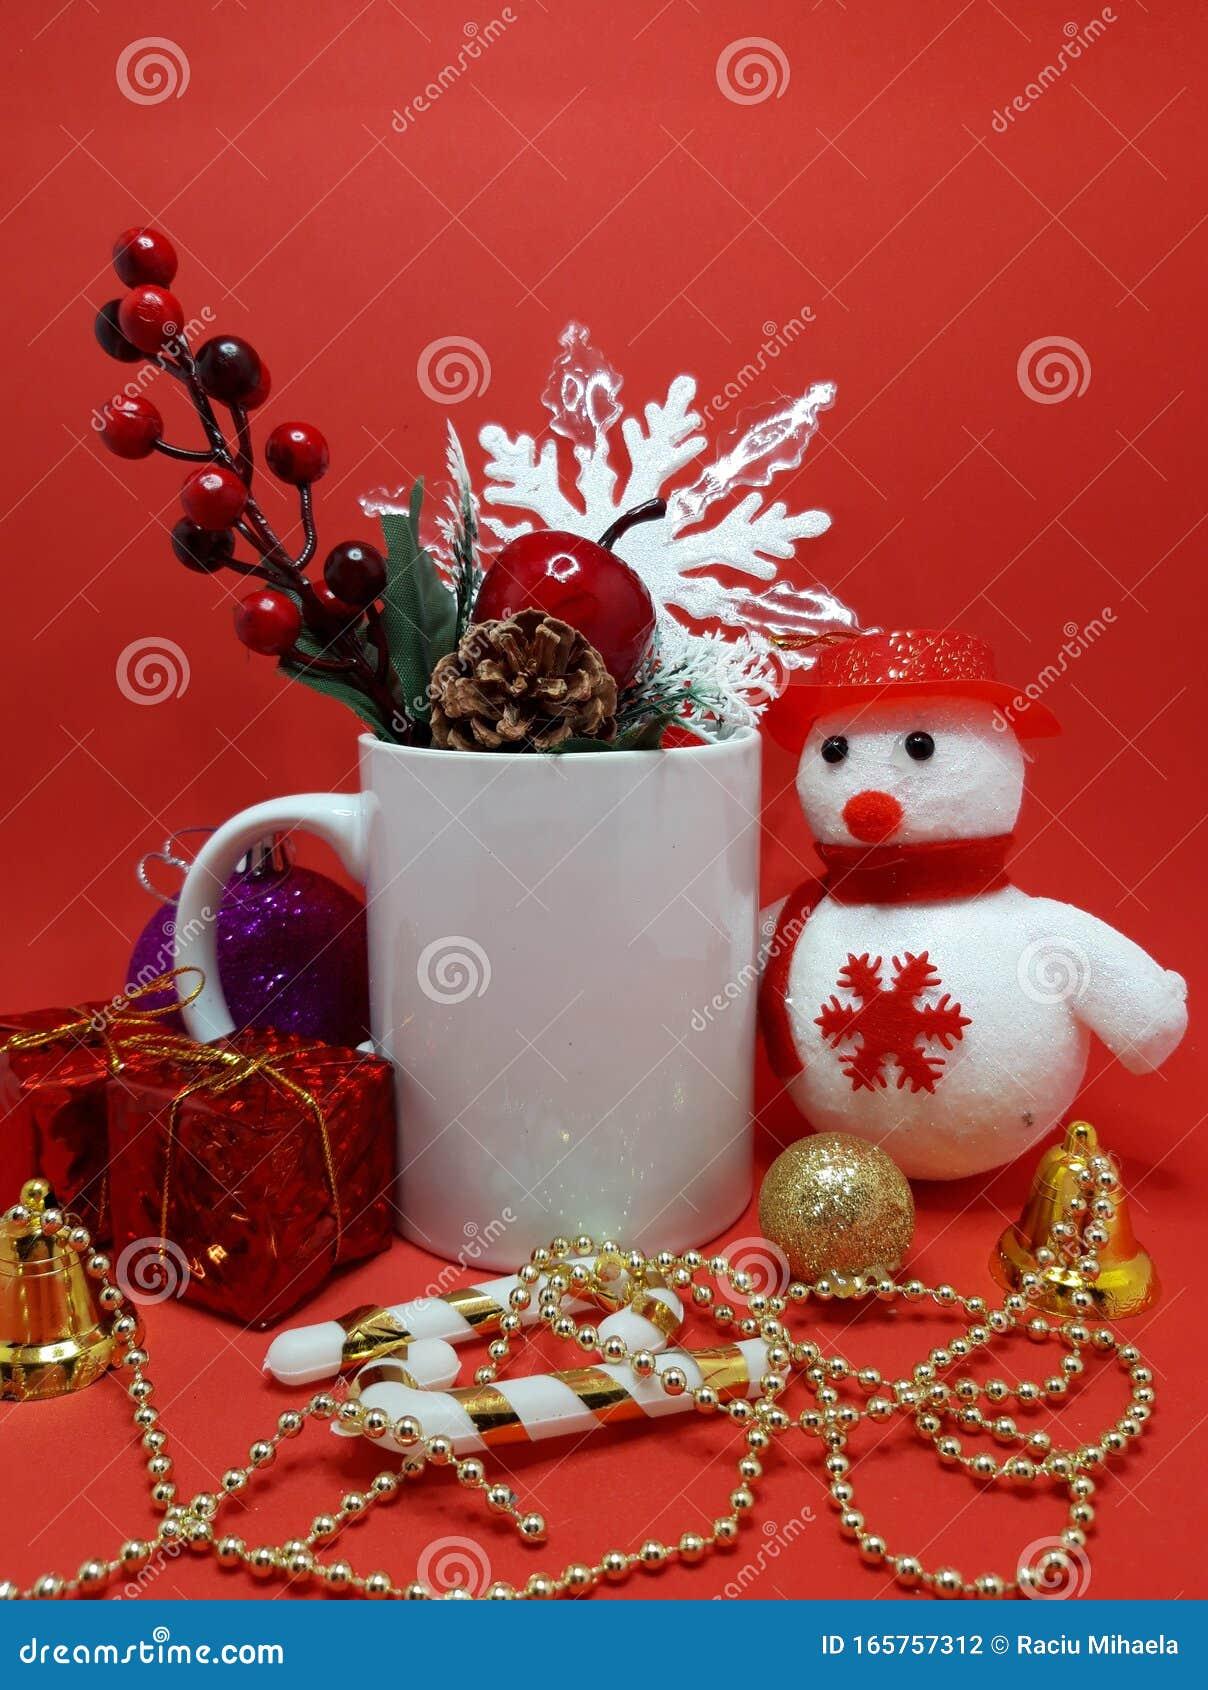 Christmas Mug Mockup With Red Background Stock Photo Image Of Decoration Christmas 165757312